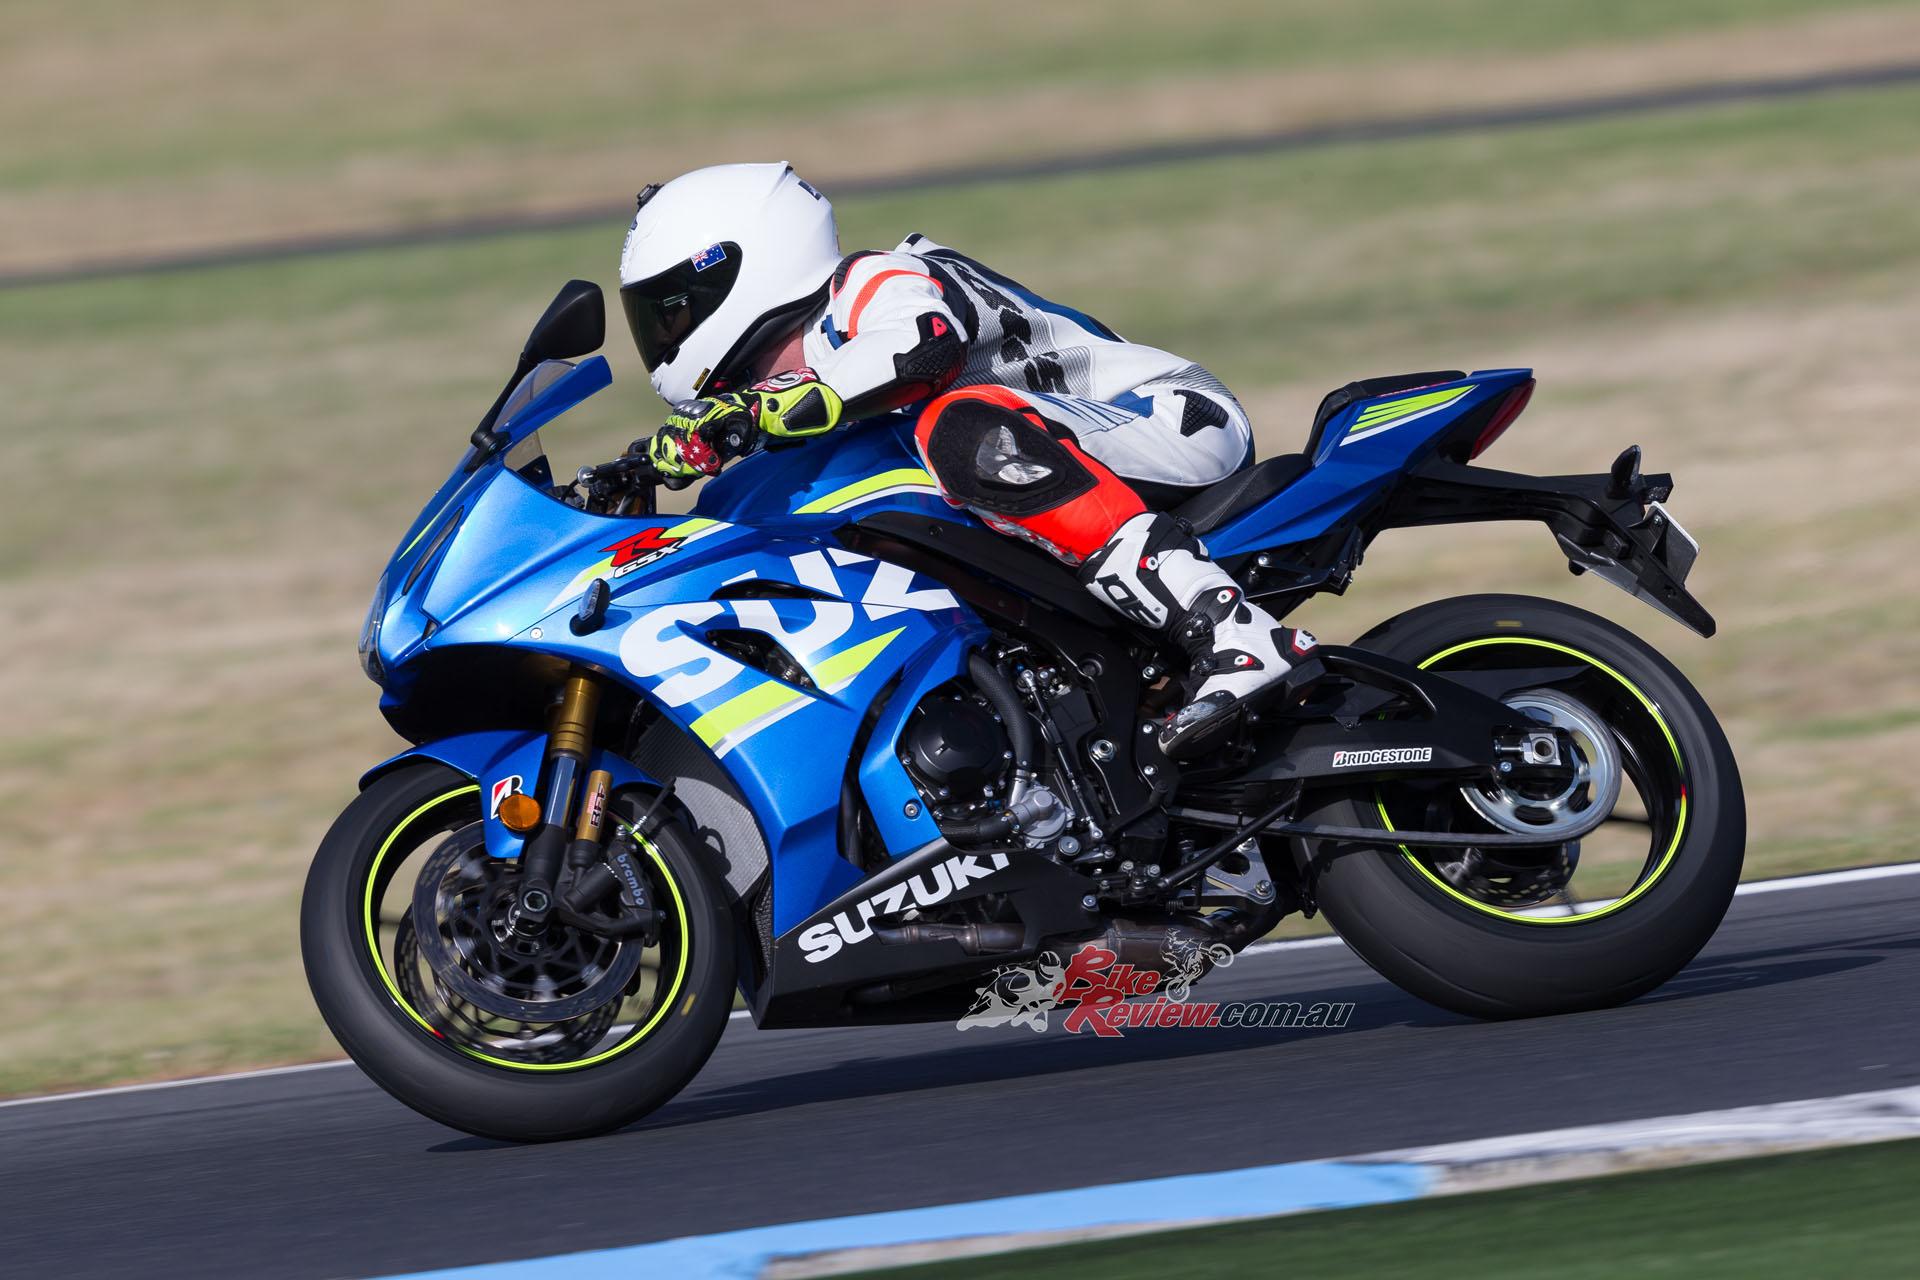 Video Review: 2017 Suzuki GSX-R1000R - Bike Review